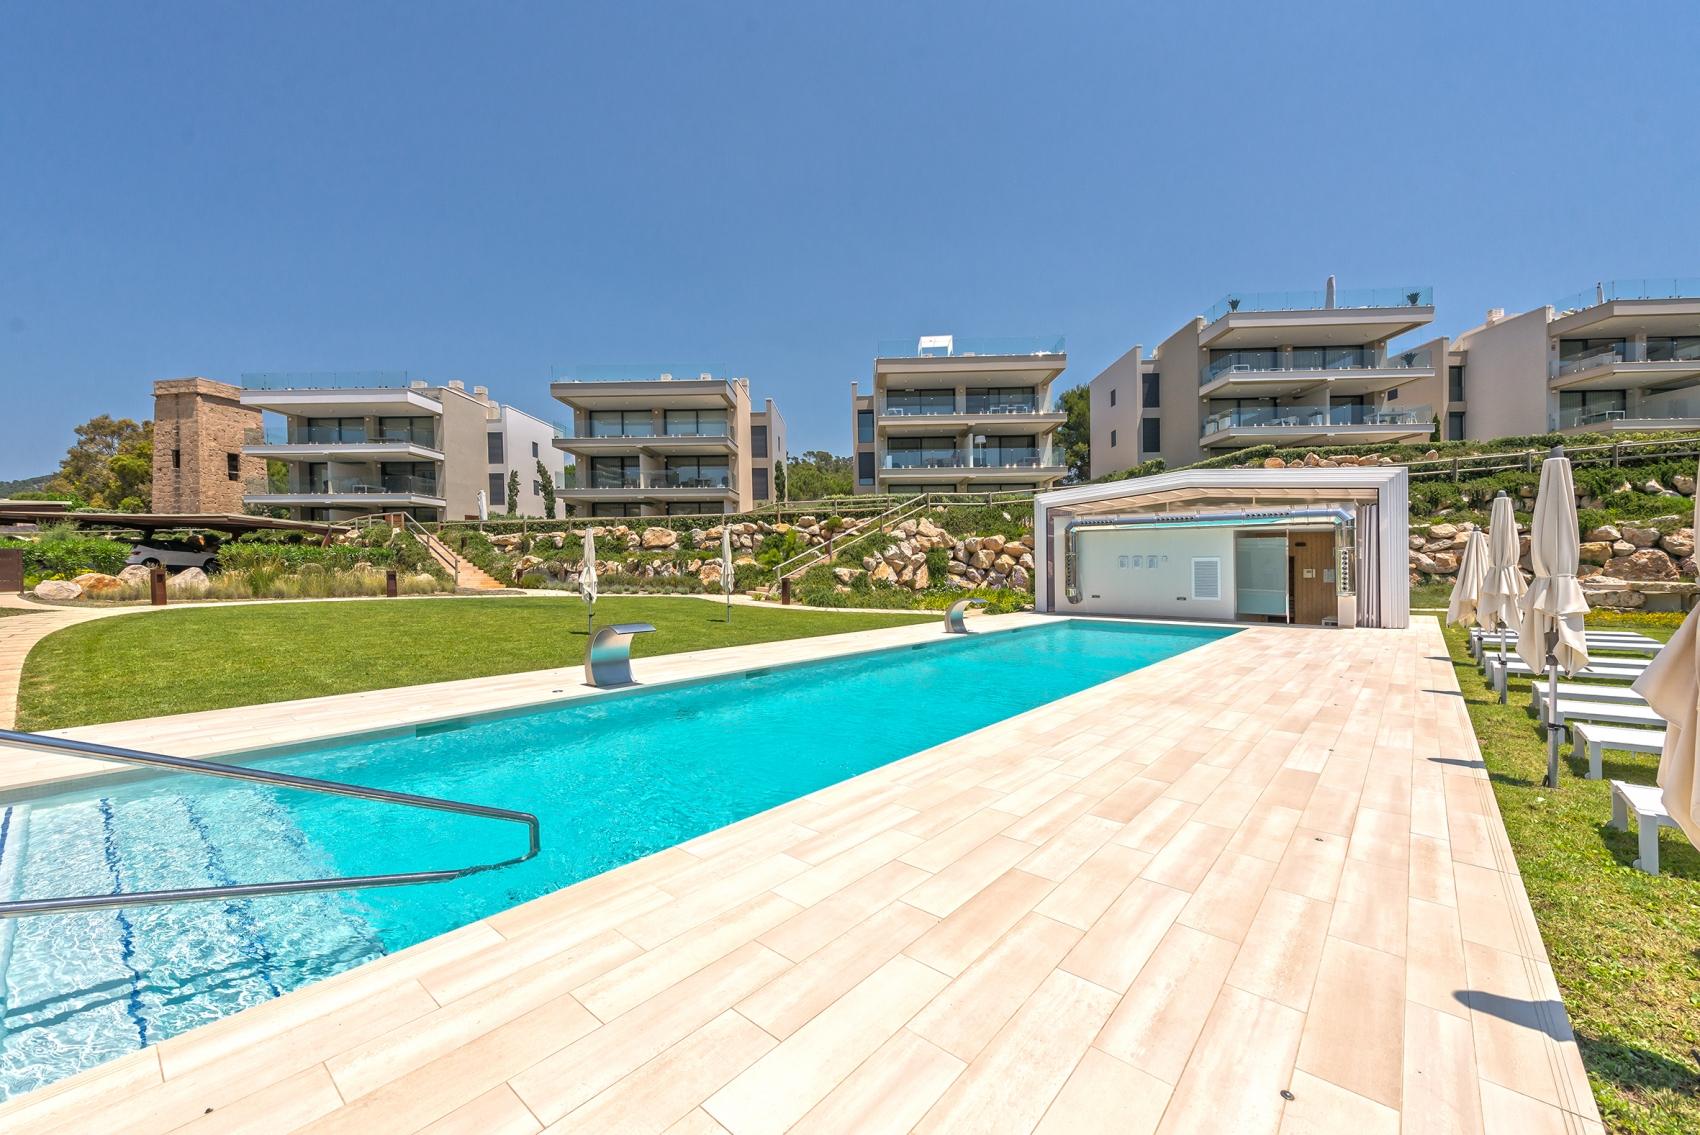 Seaview property in Mallorca